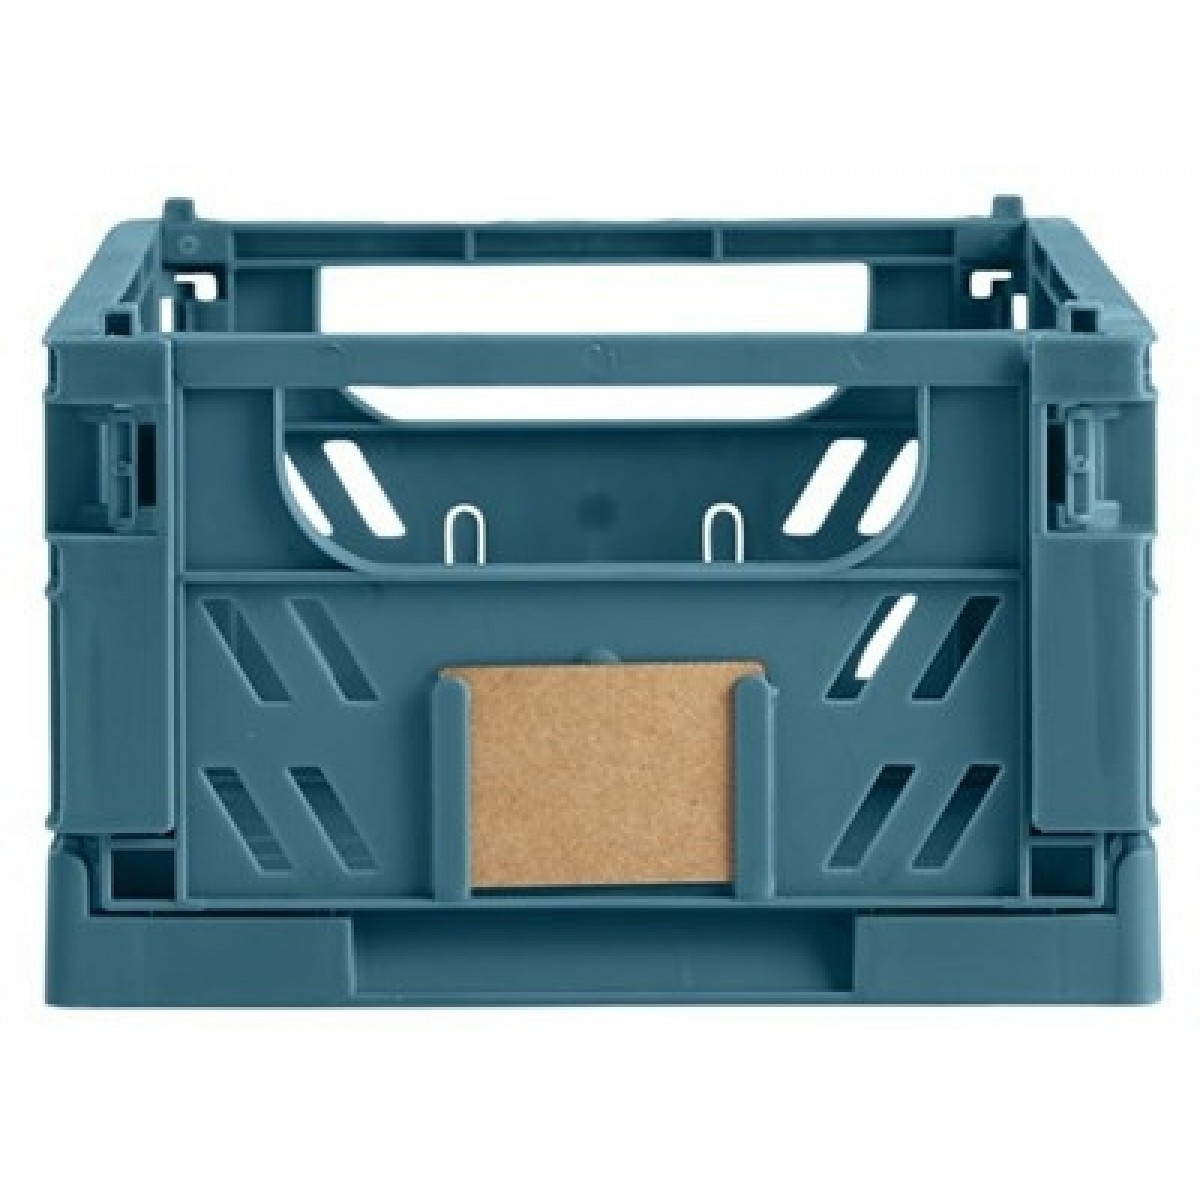 DAY Opbevaringskasse foldbar 25x16,5x10 cm tapestry blue